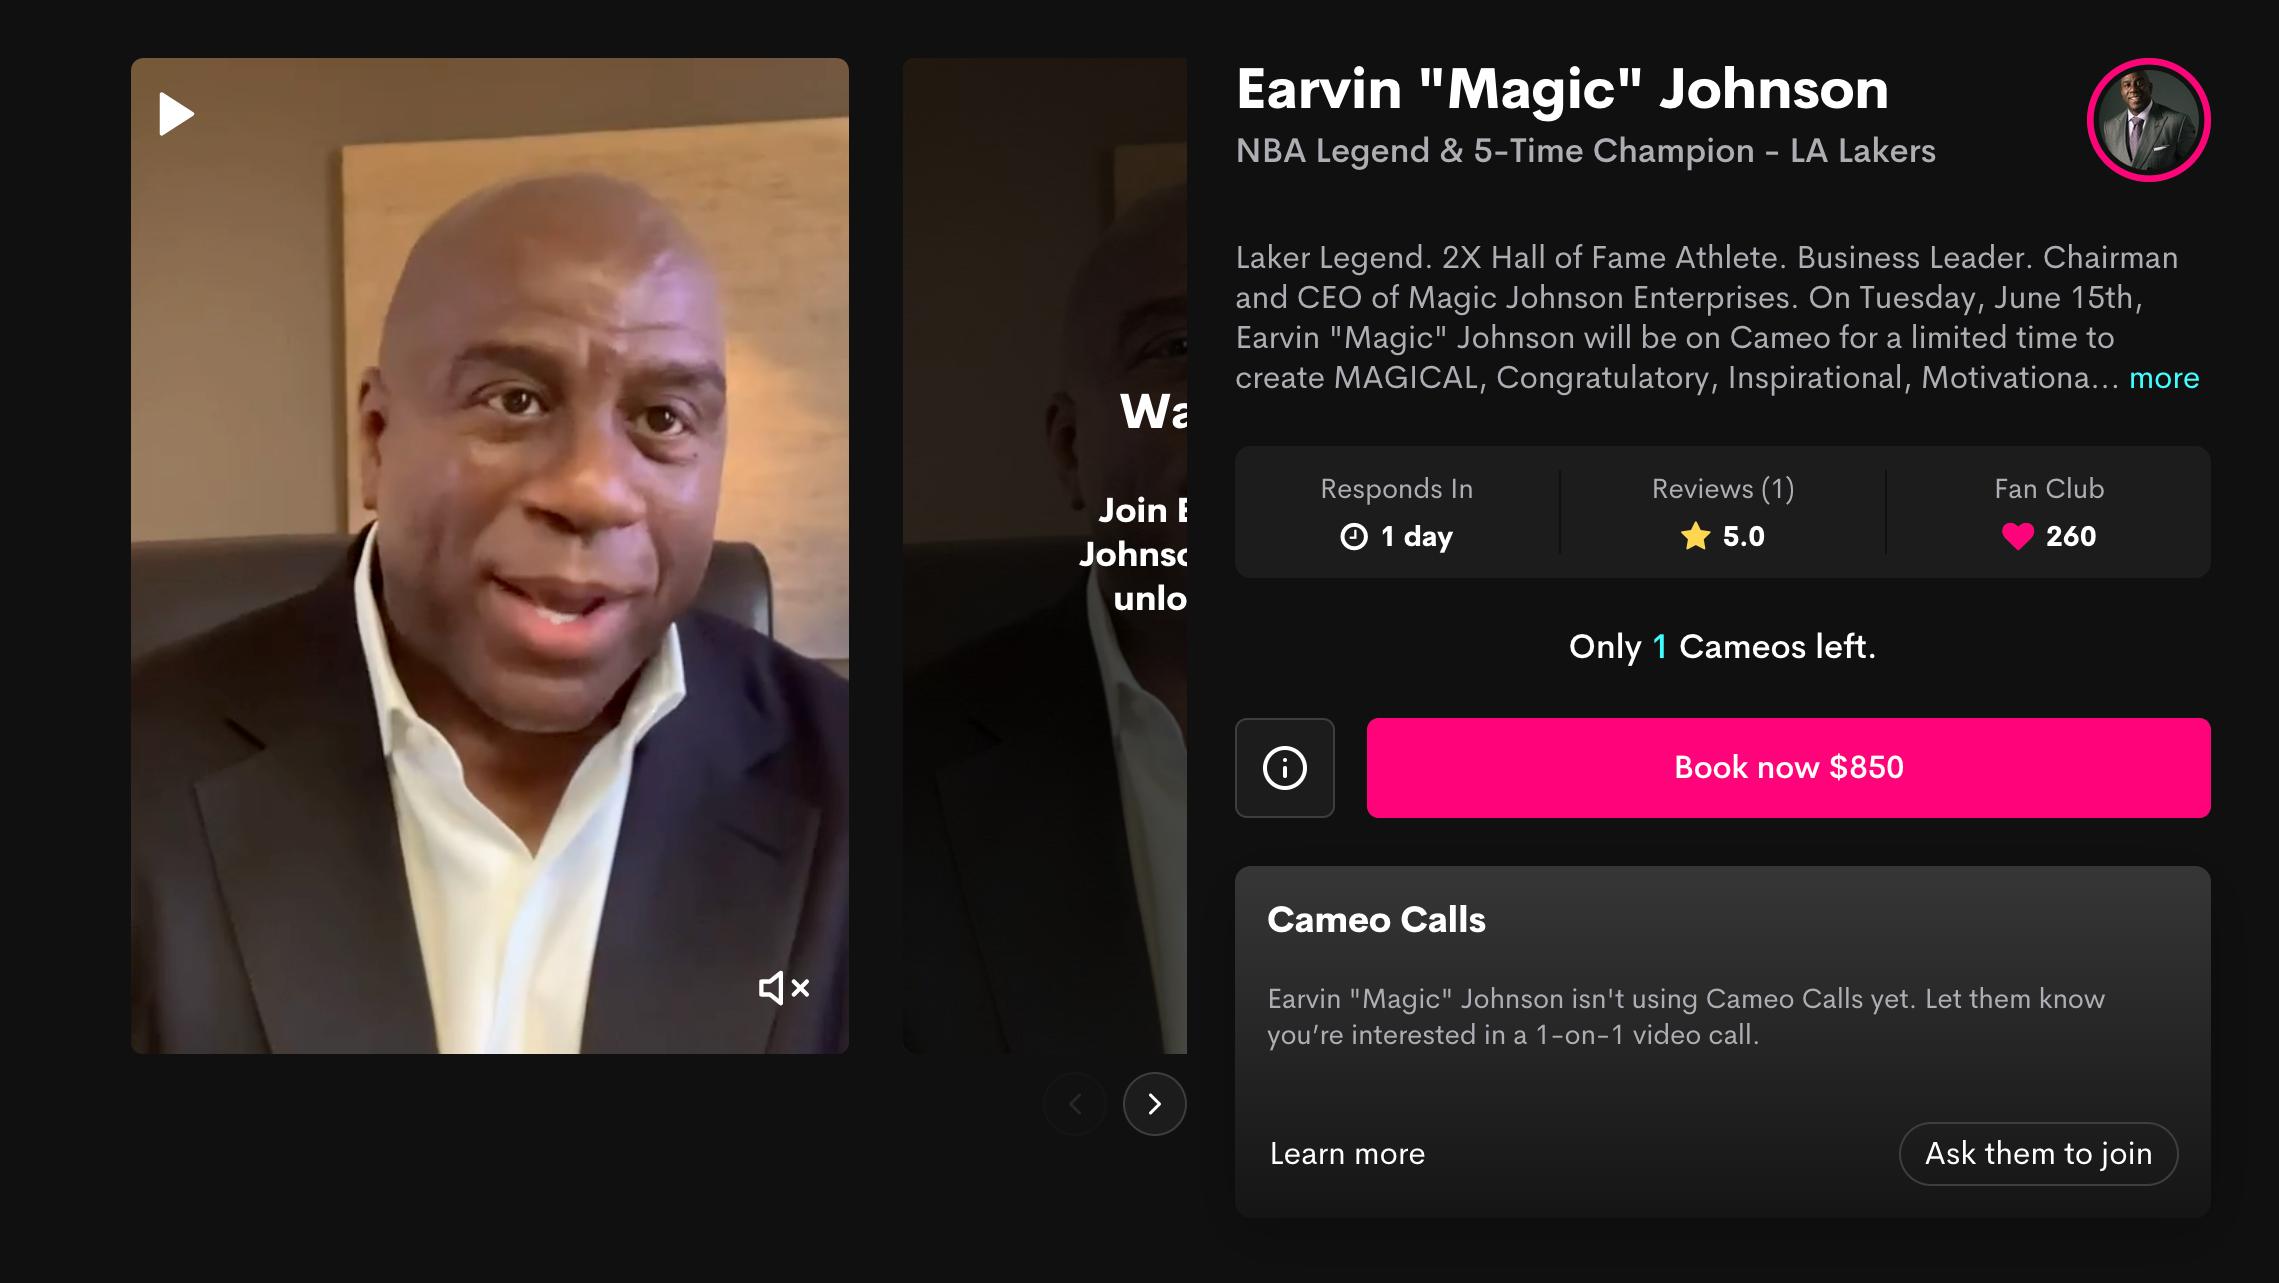 Magic Johnson's Cameo profile